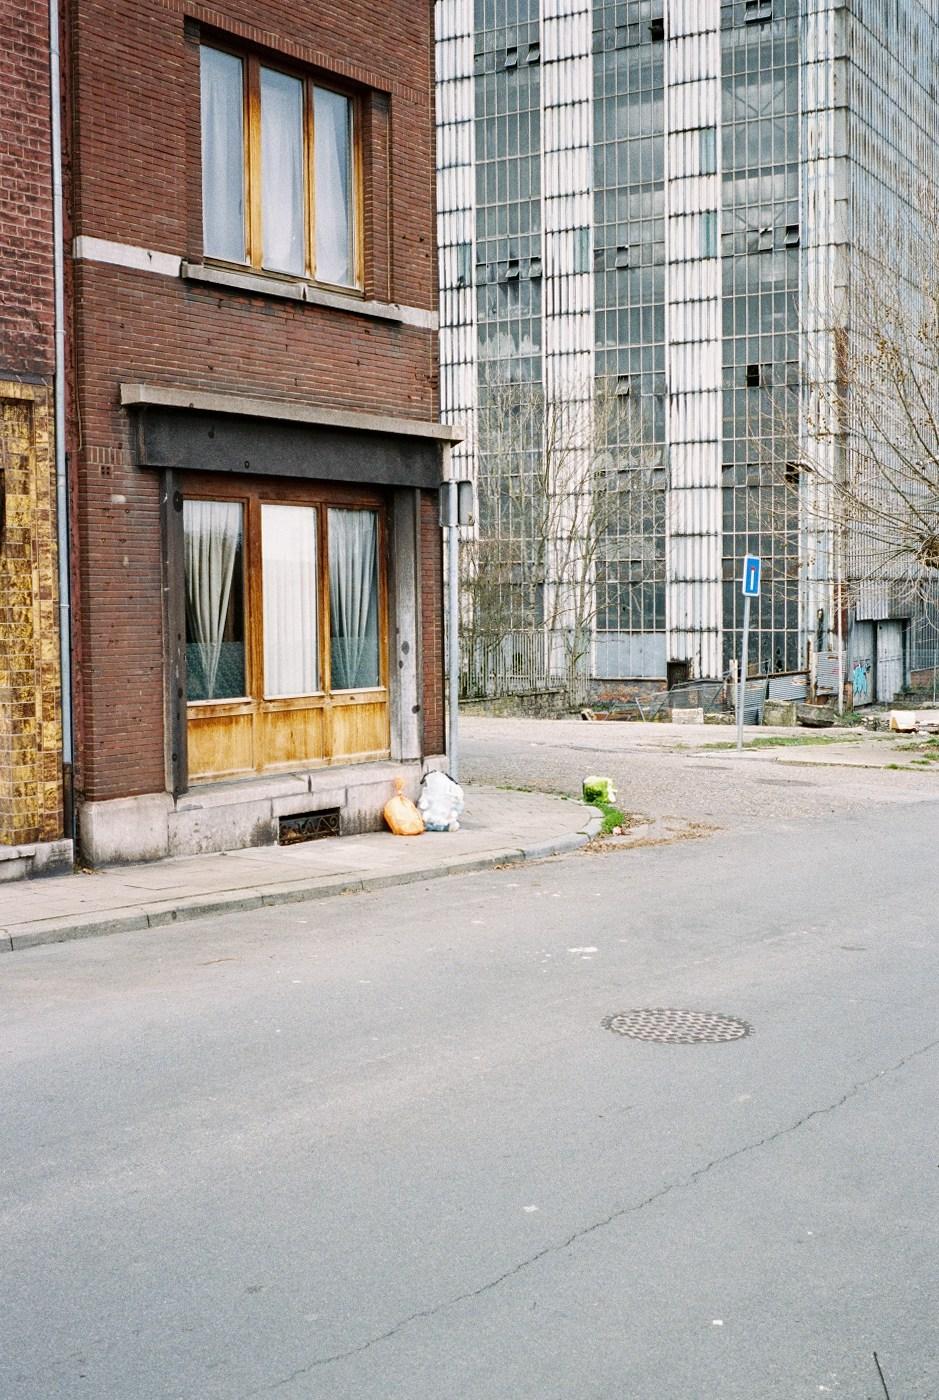 000033JoergBergs-KodakPortra400-MeinFilmLab-M7-35 (1)